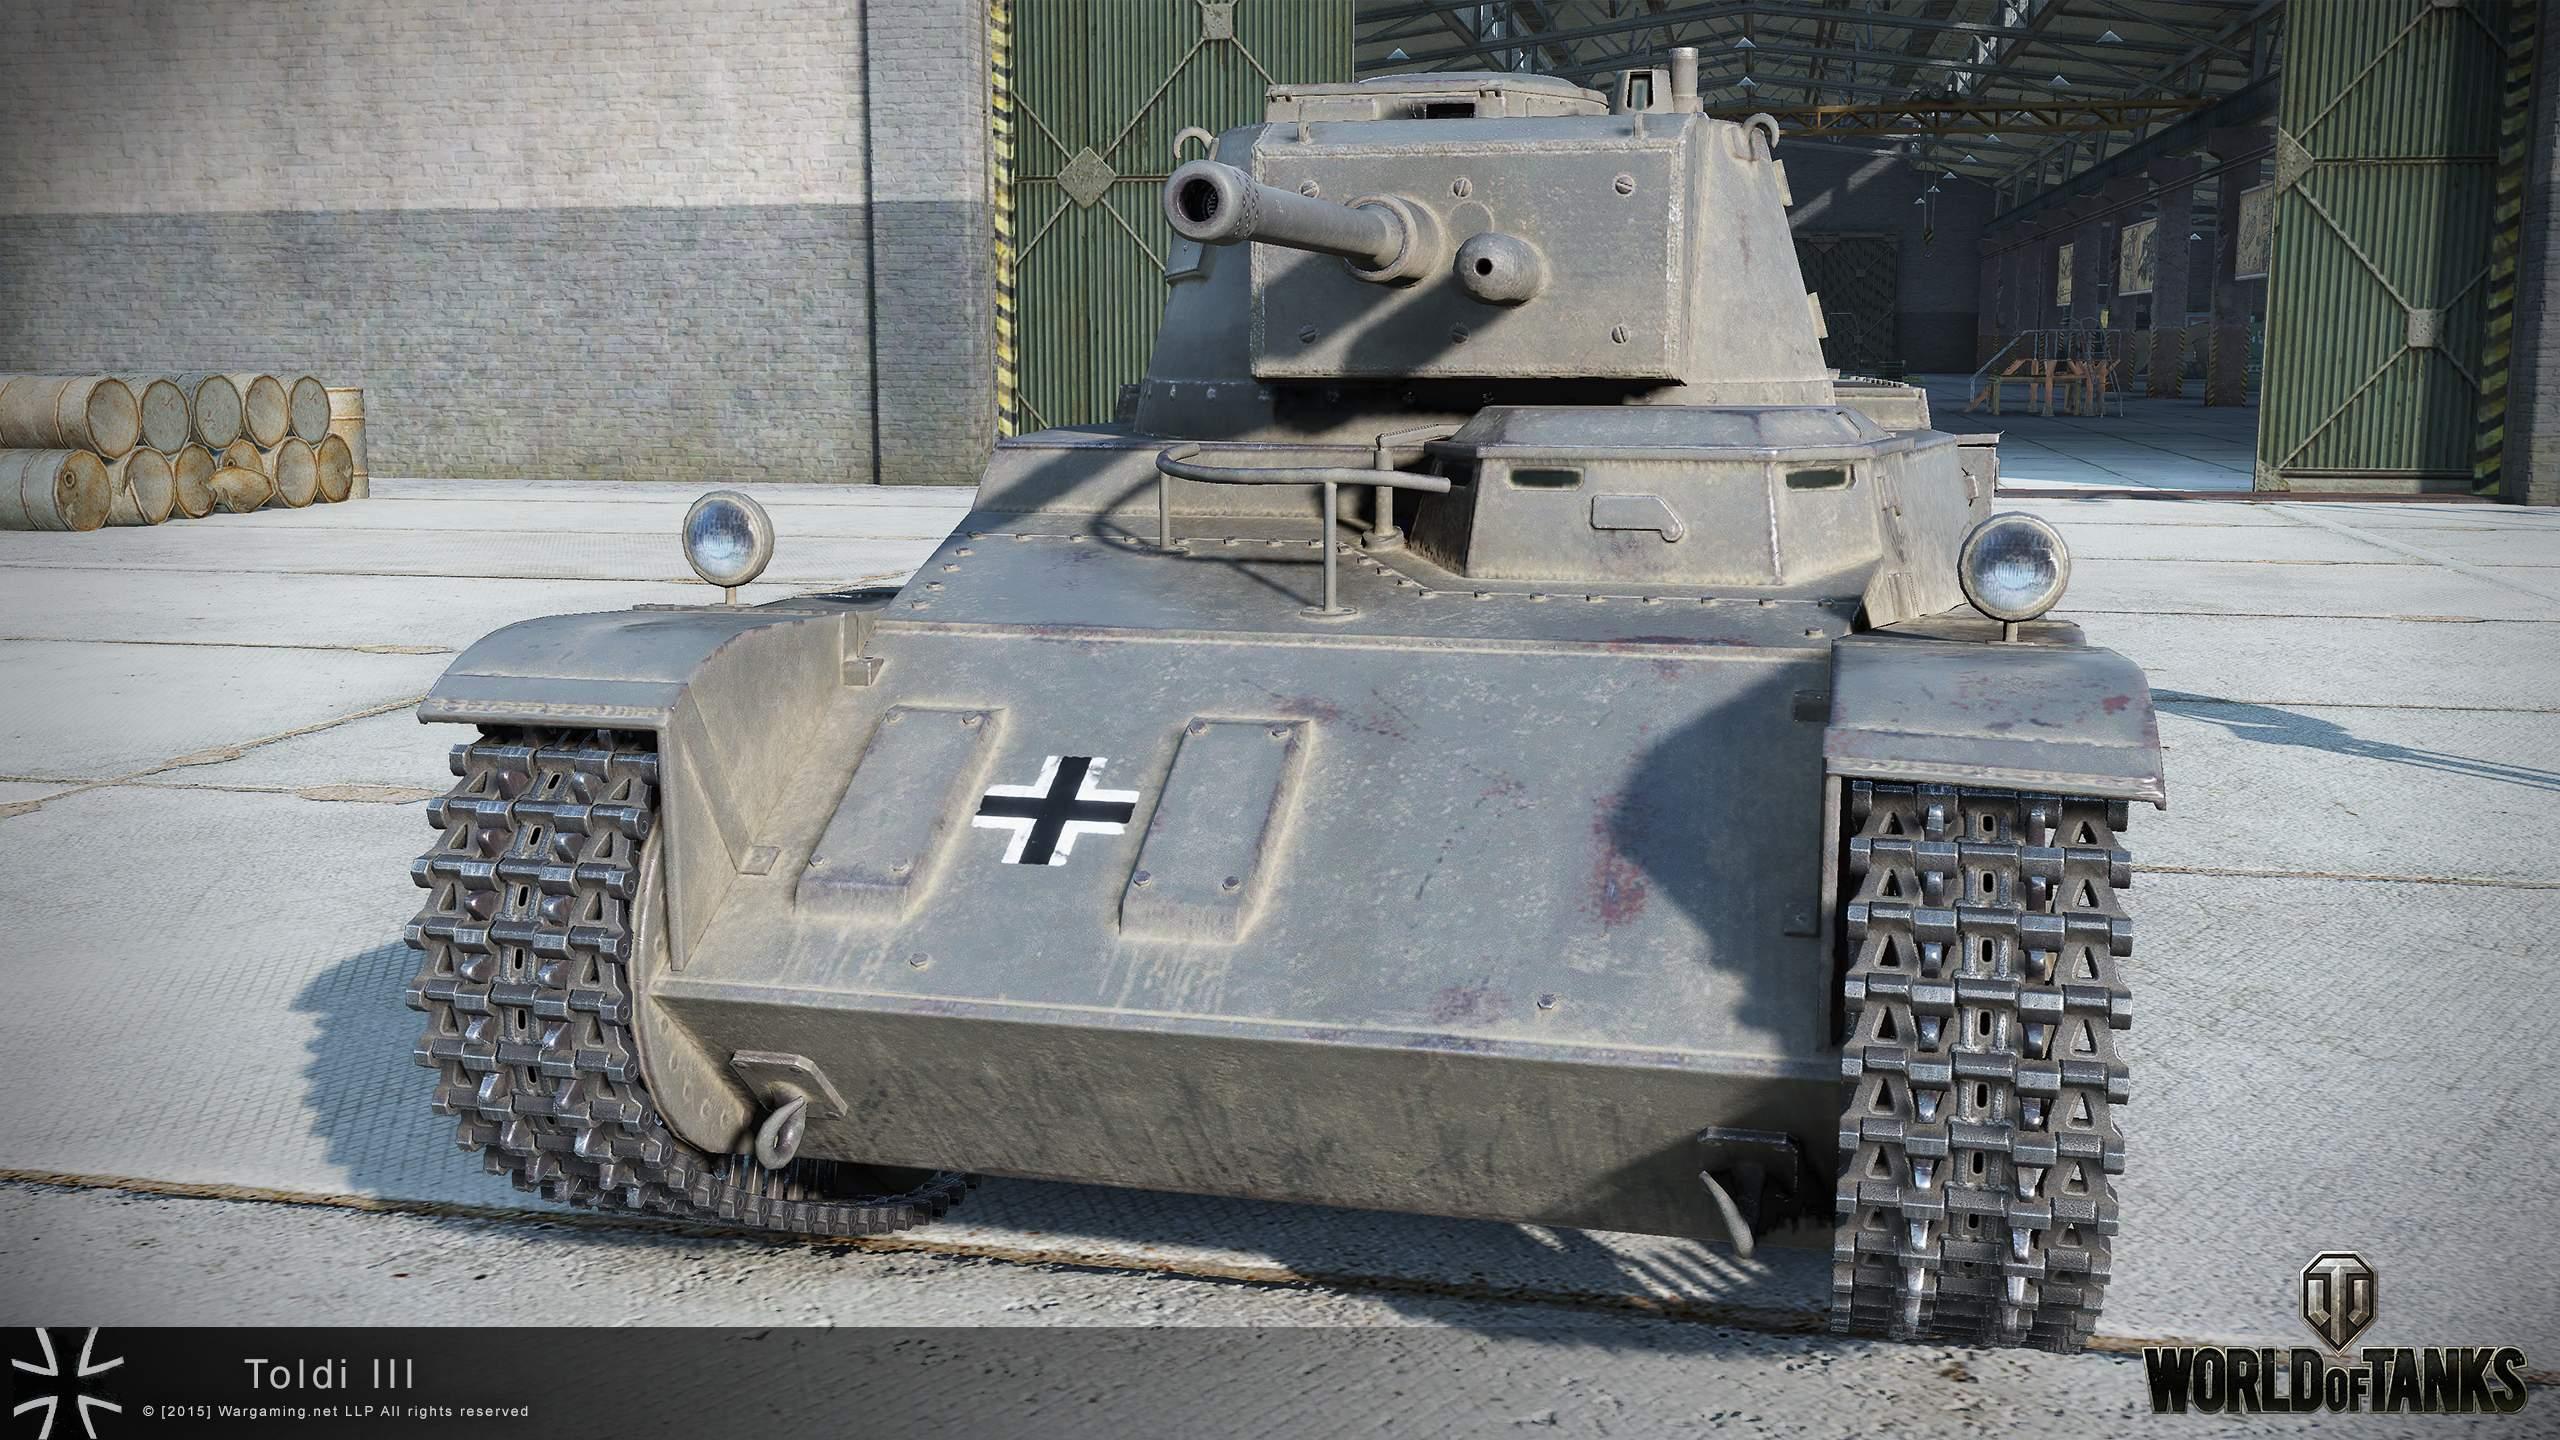 world of tanks matilda guide